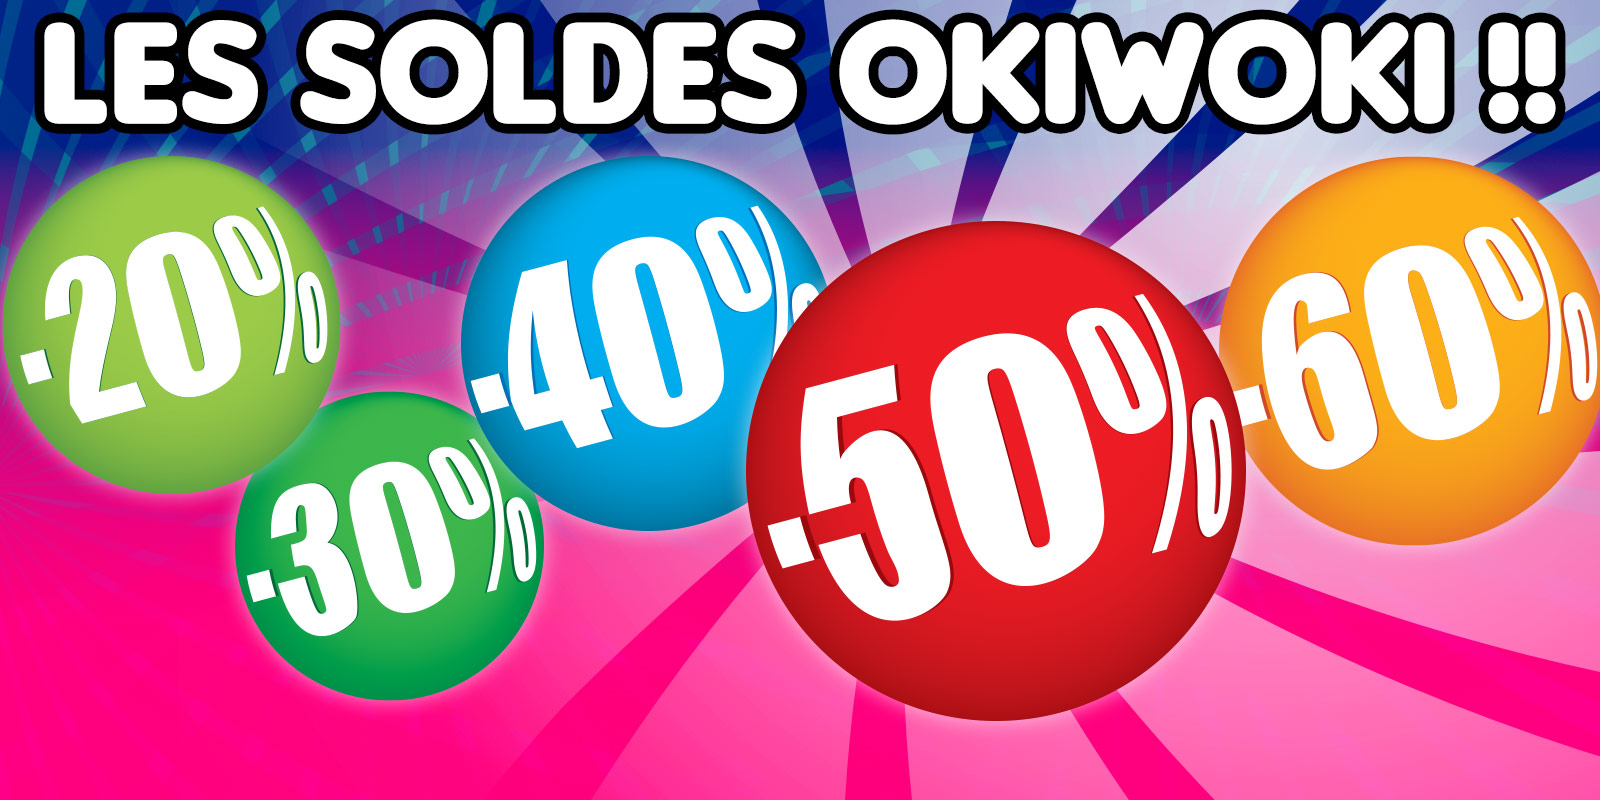 Les Soldes okiWoki !!